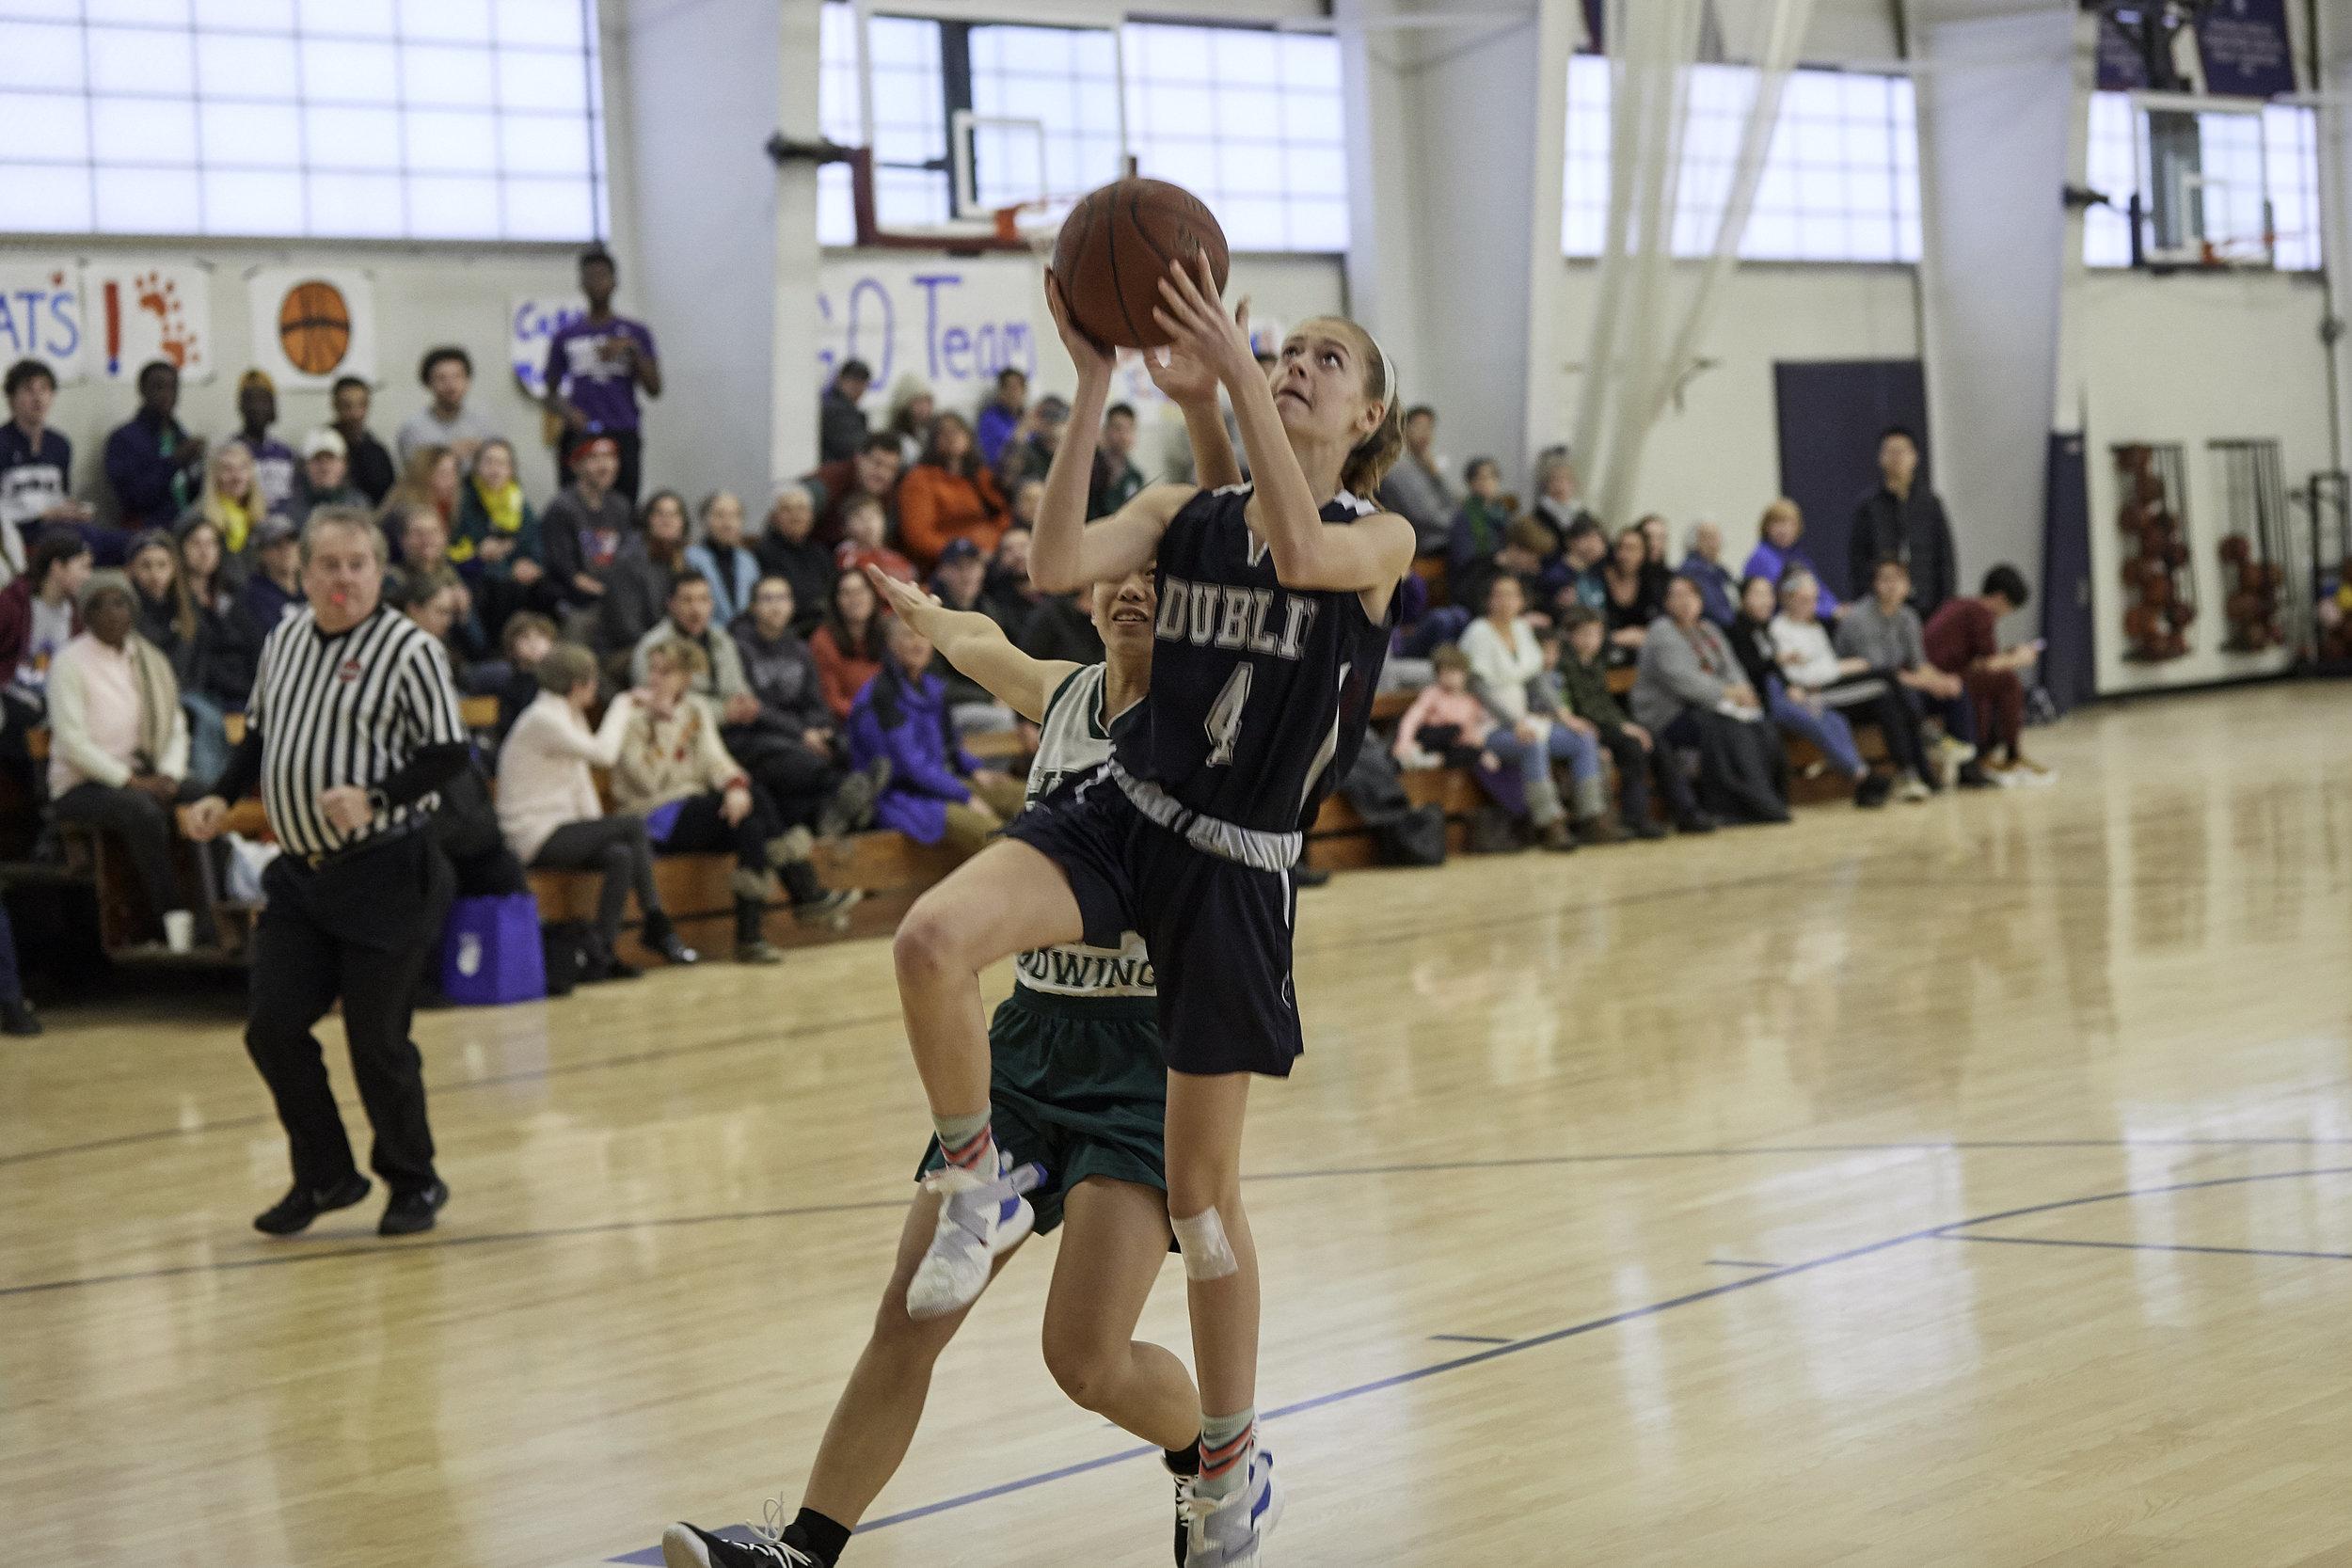 Basketball vs High Mowing School, February 2, 2019 - 166351.jpg